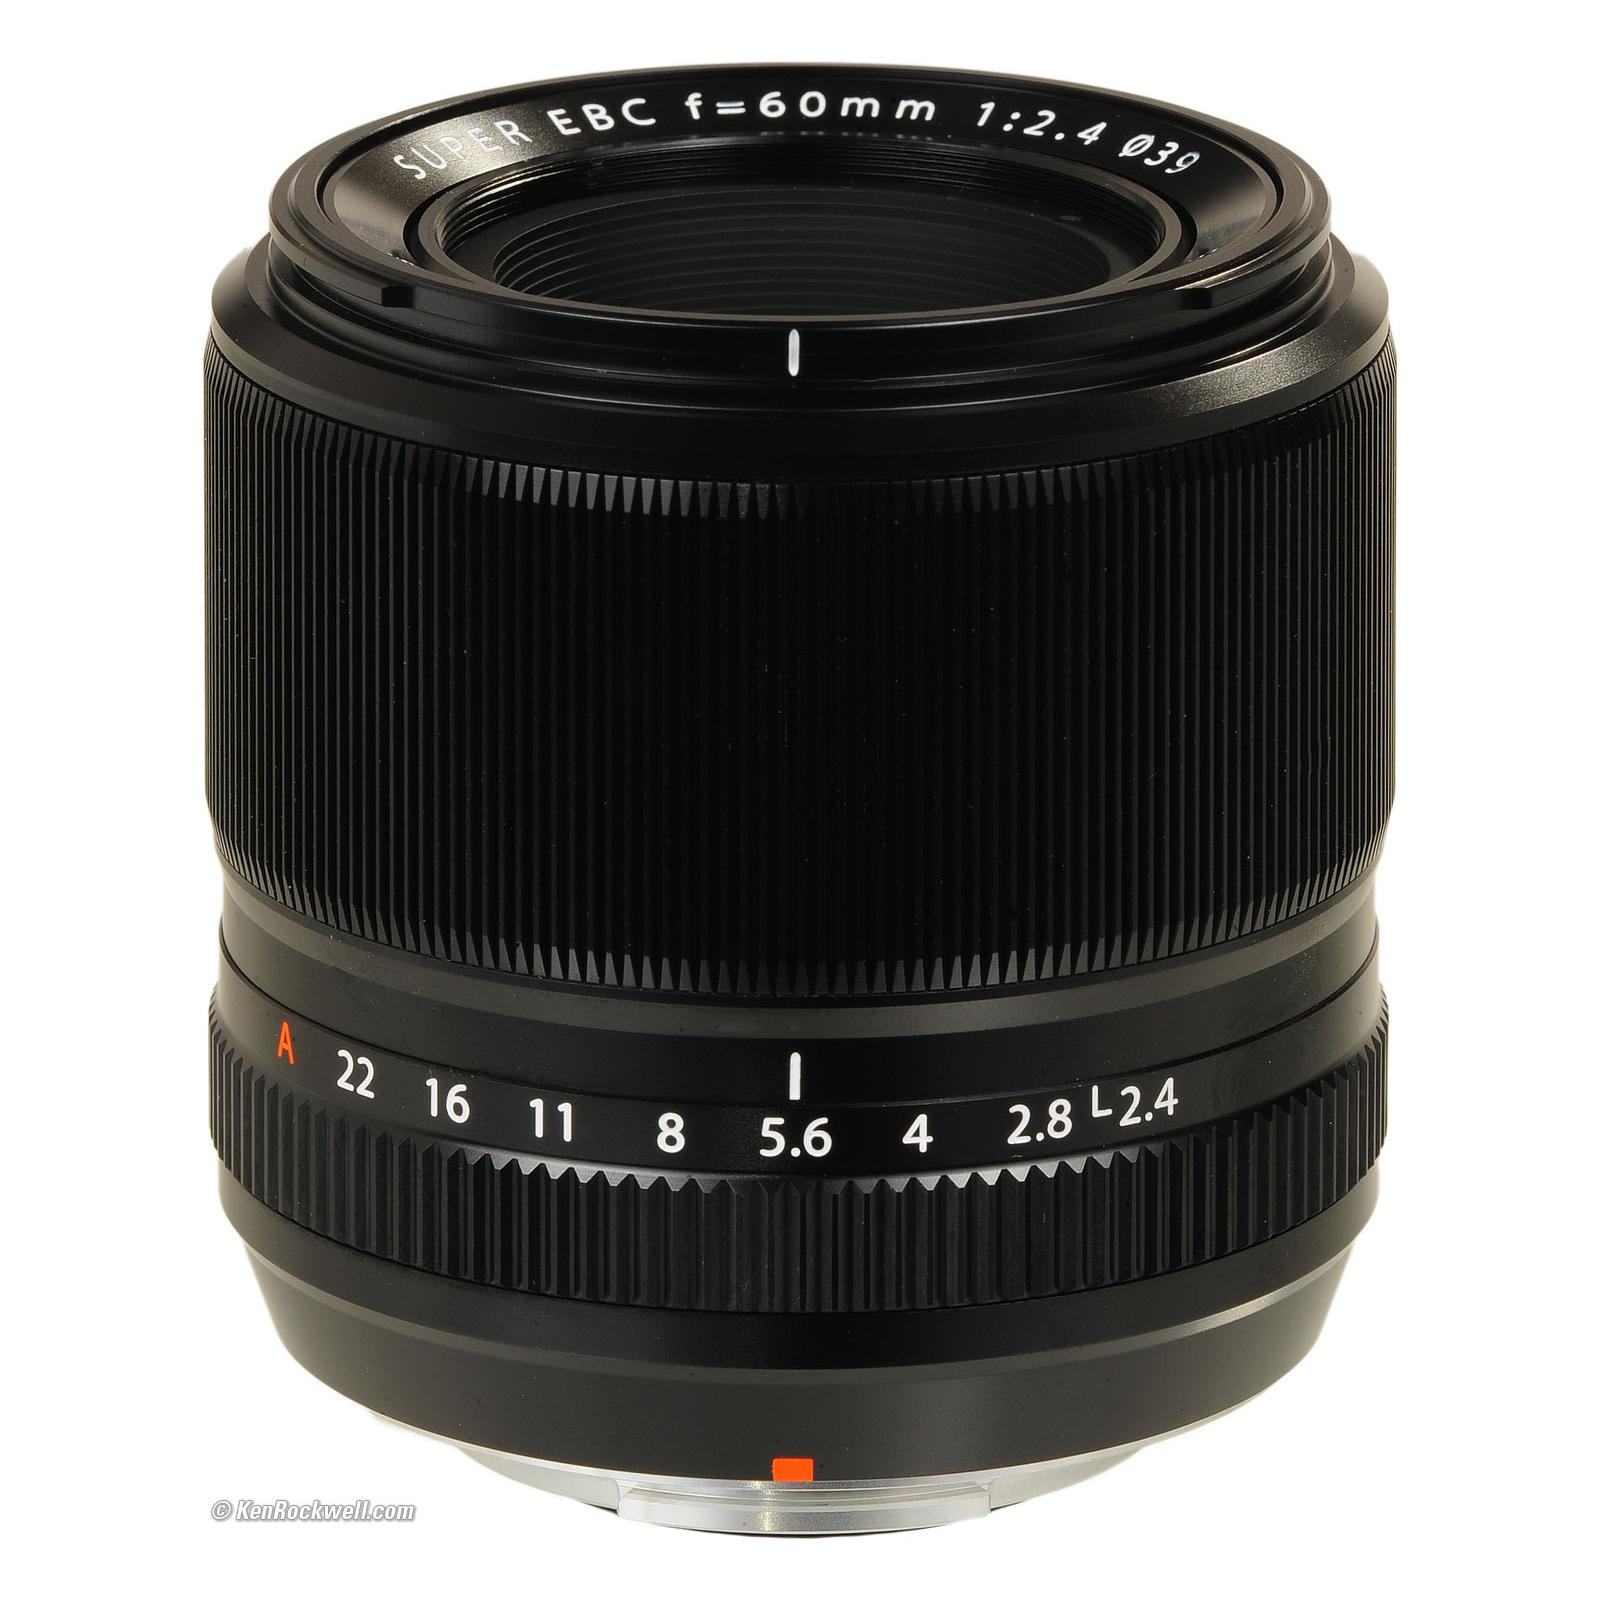 Объектив Fujifilm XF-60mm F2.4 R Macro (16240767) изображение 2